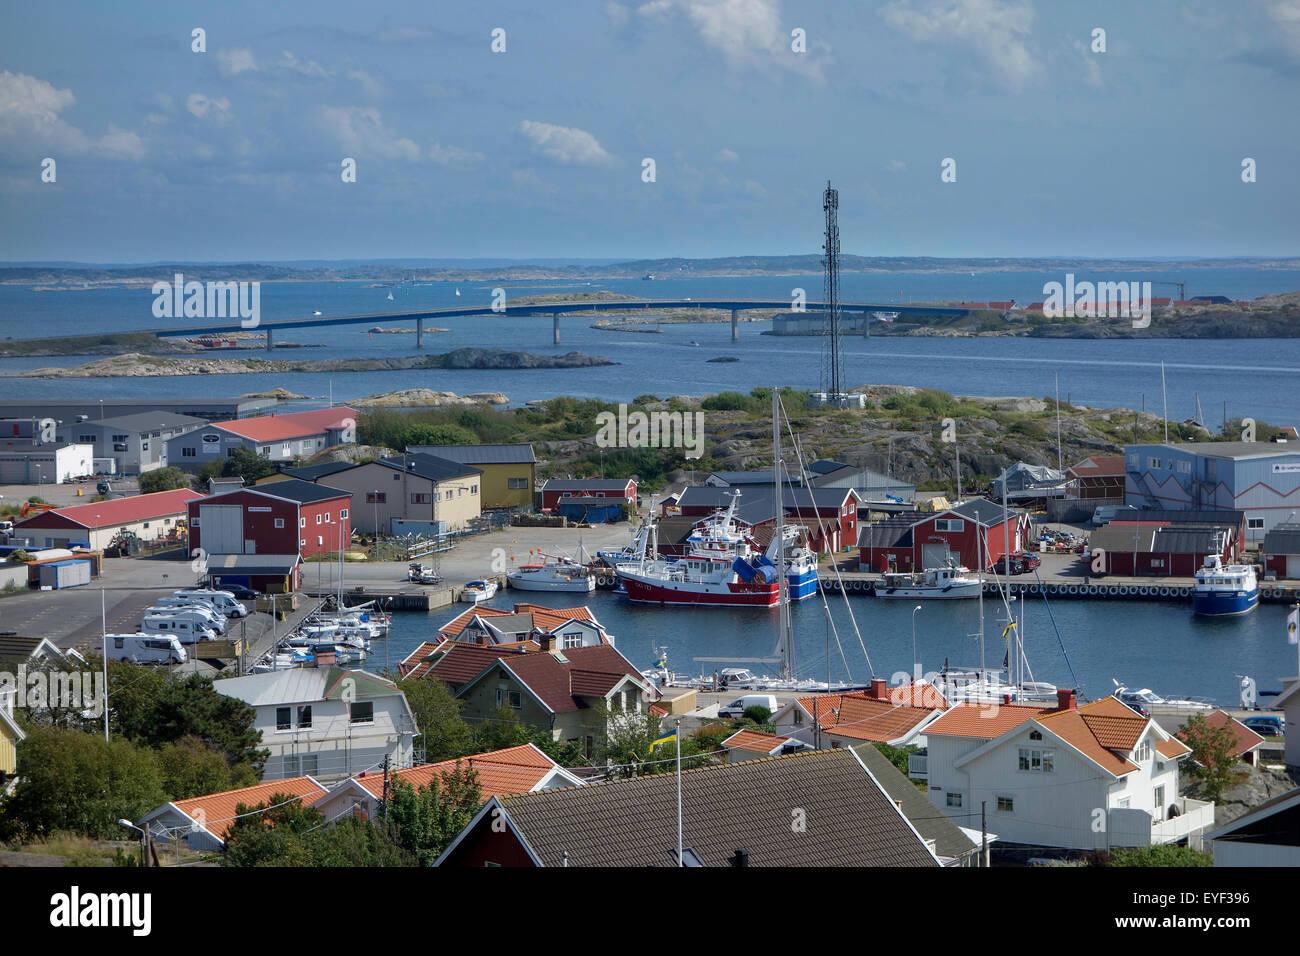 La Svezia, Bohuslan, residenziale cottage sui Hönö isola, Klåva porto di pesca e ponte Fotö Immagini Stock